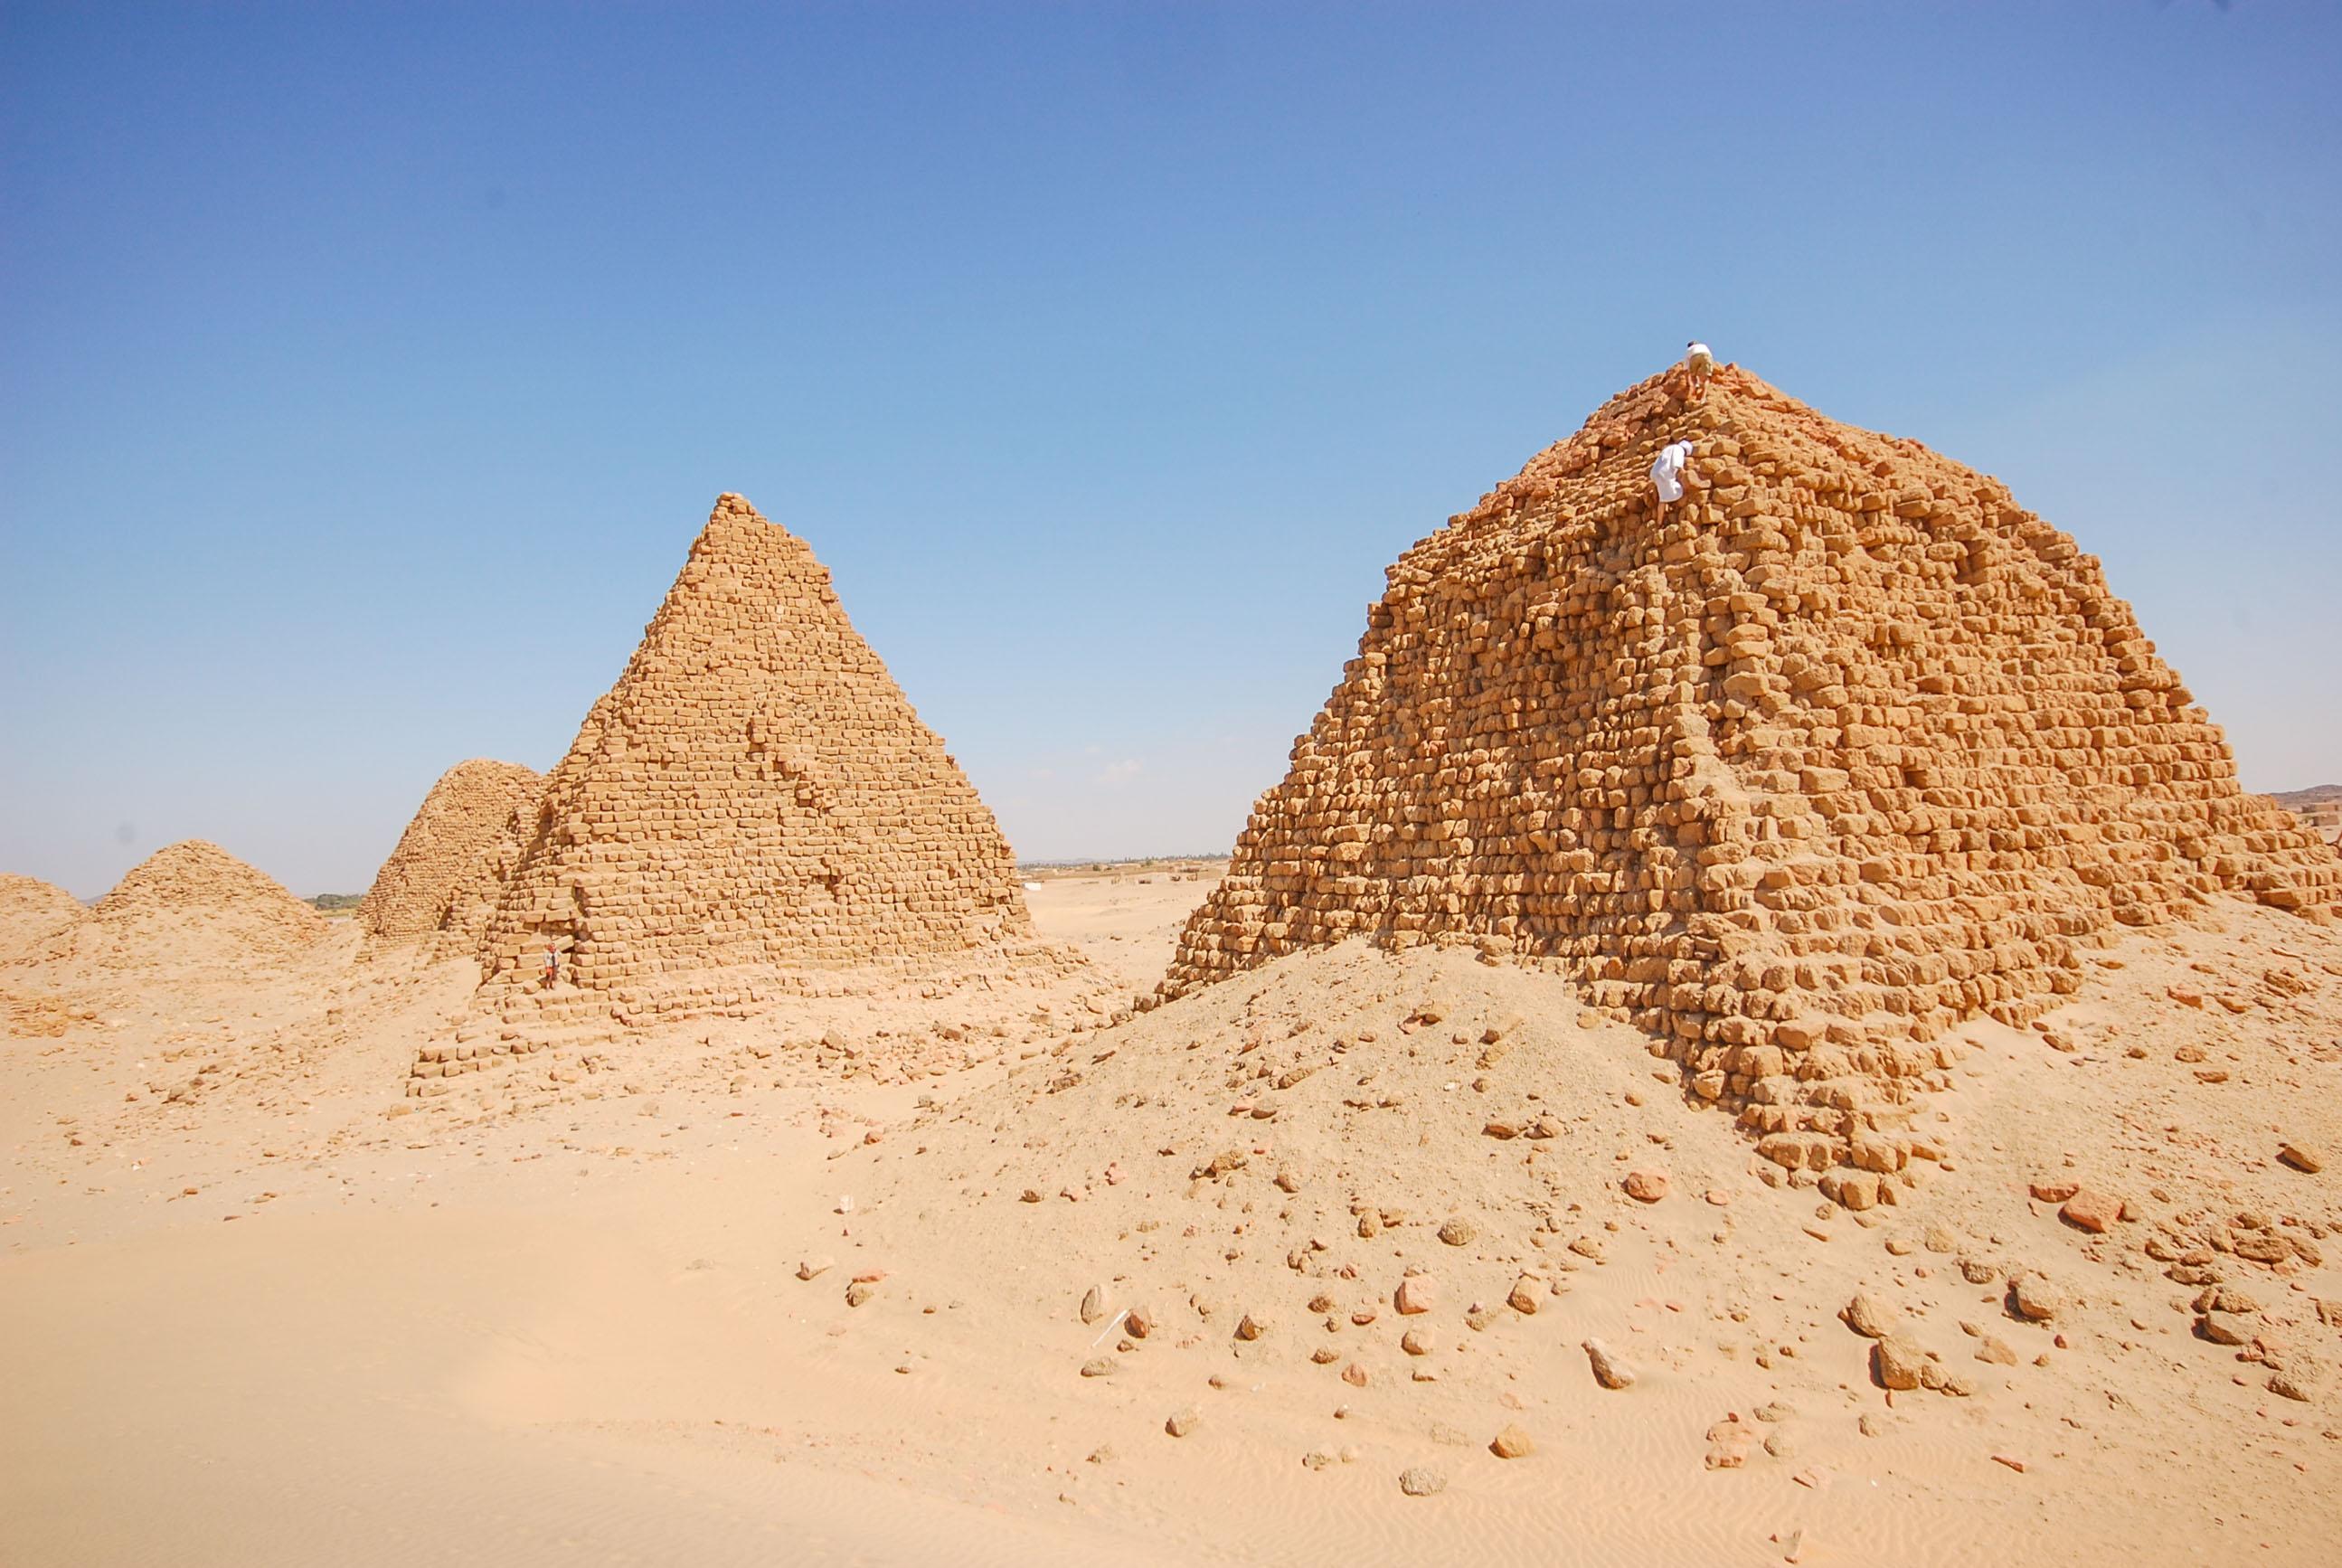 https://bubo.sk/uploads/galleries/17820/lubosfellner_sudan_6s-sudan-a-bubo-foto-exklusive.jpg